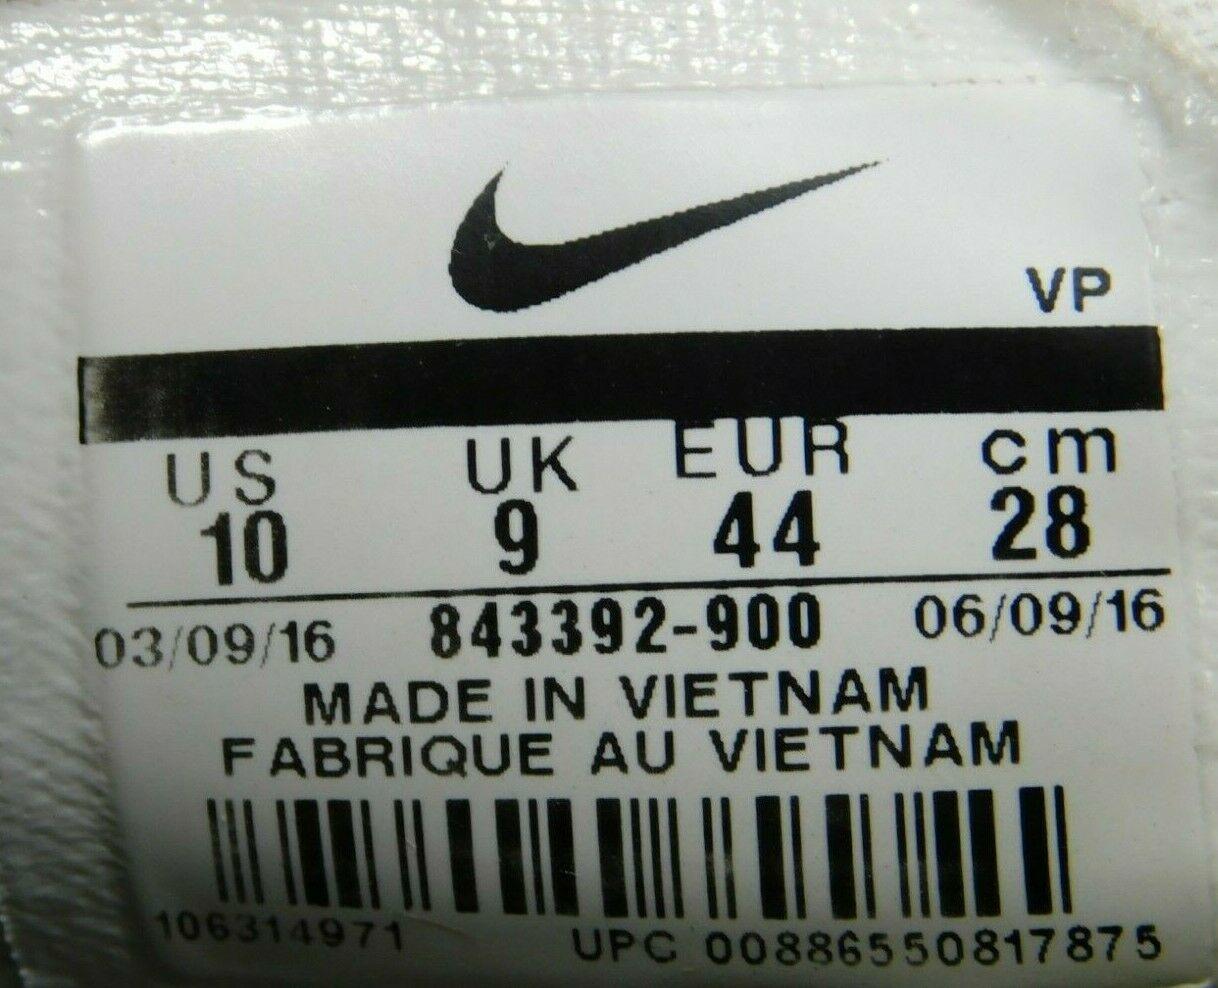 Nike Zoom KD 9 IX Size US 10 M (D) EU 44 Men's Basketball Shoes Multi 843392-900 image 11